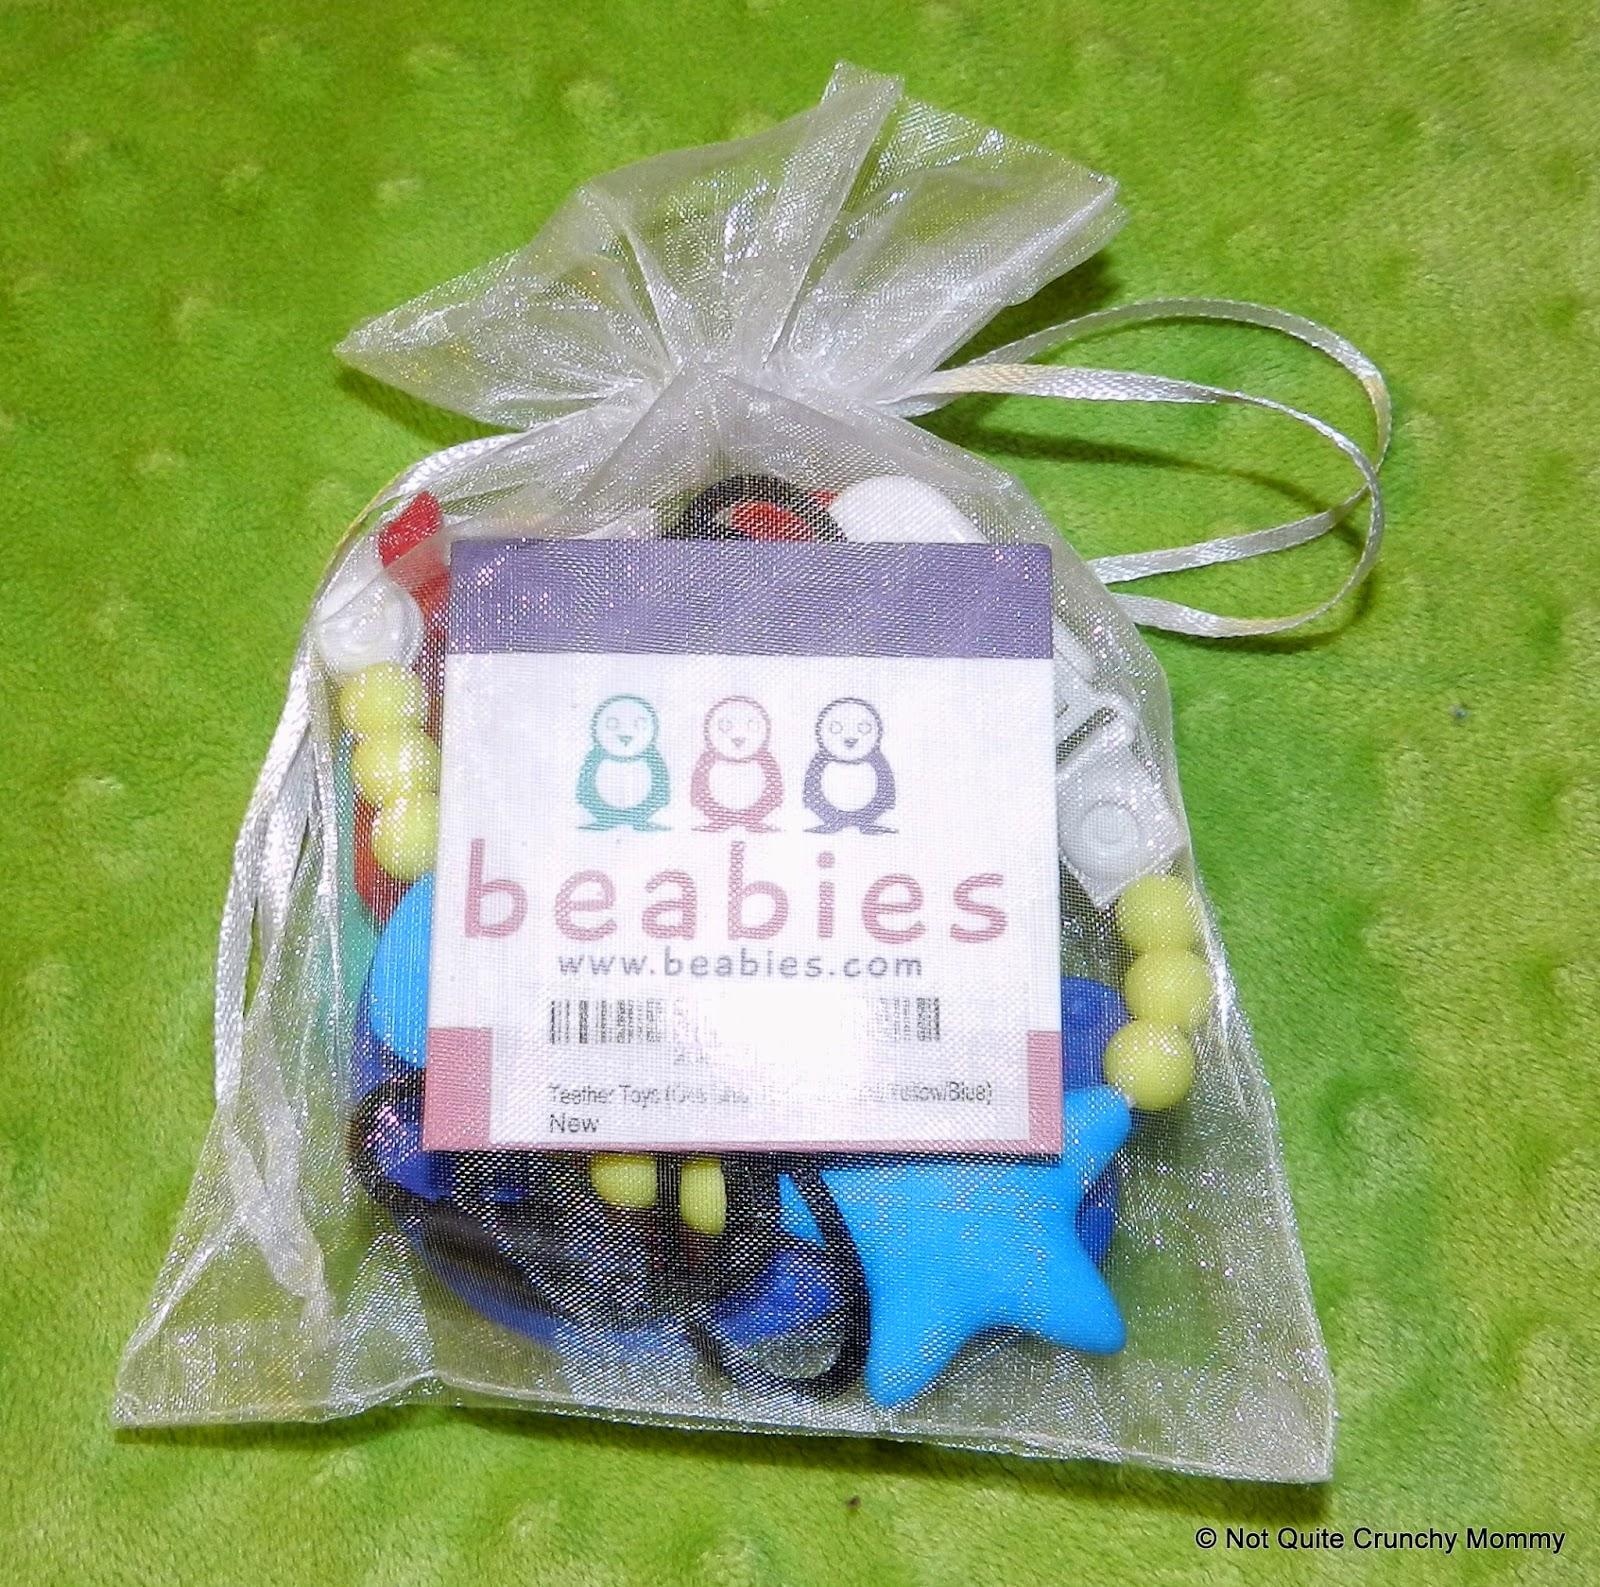 http://notquitecrunchymommy.blogspot.com/2015/03/beabies-teether-toys-review.html